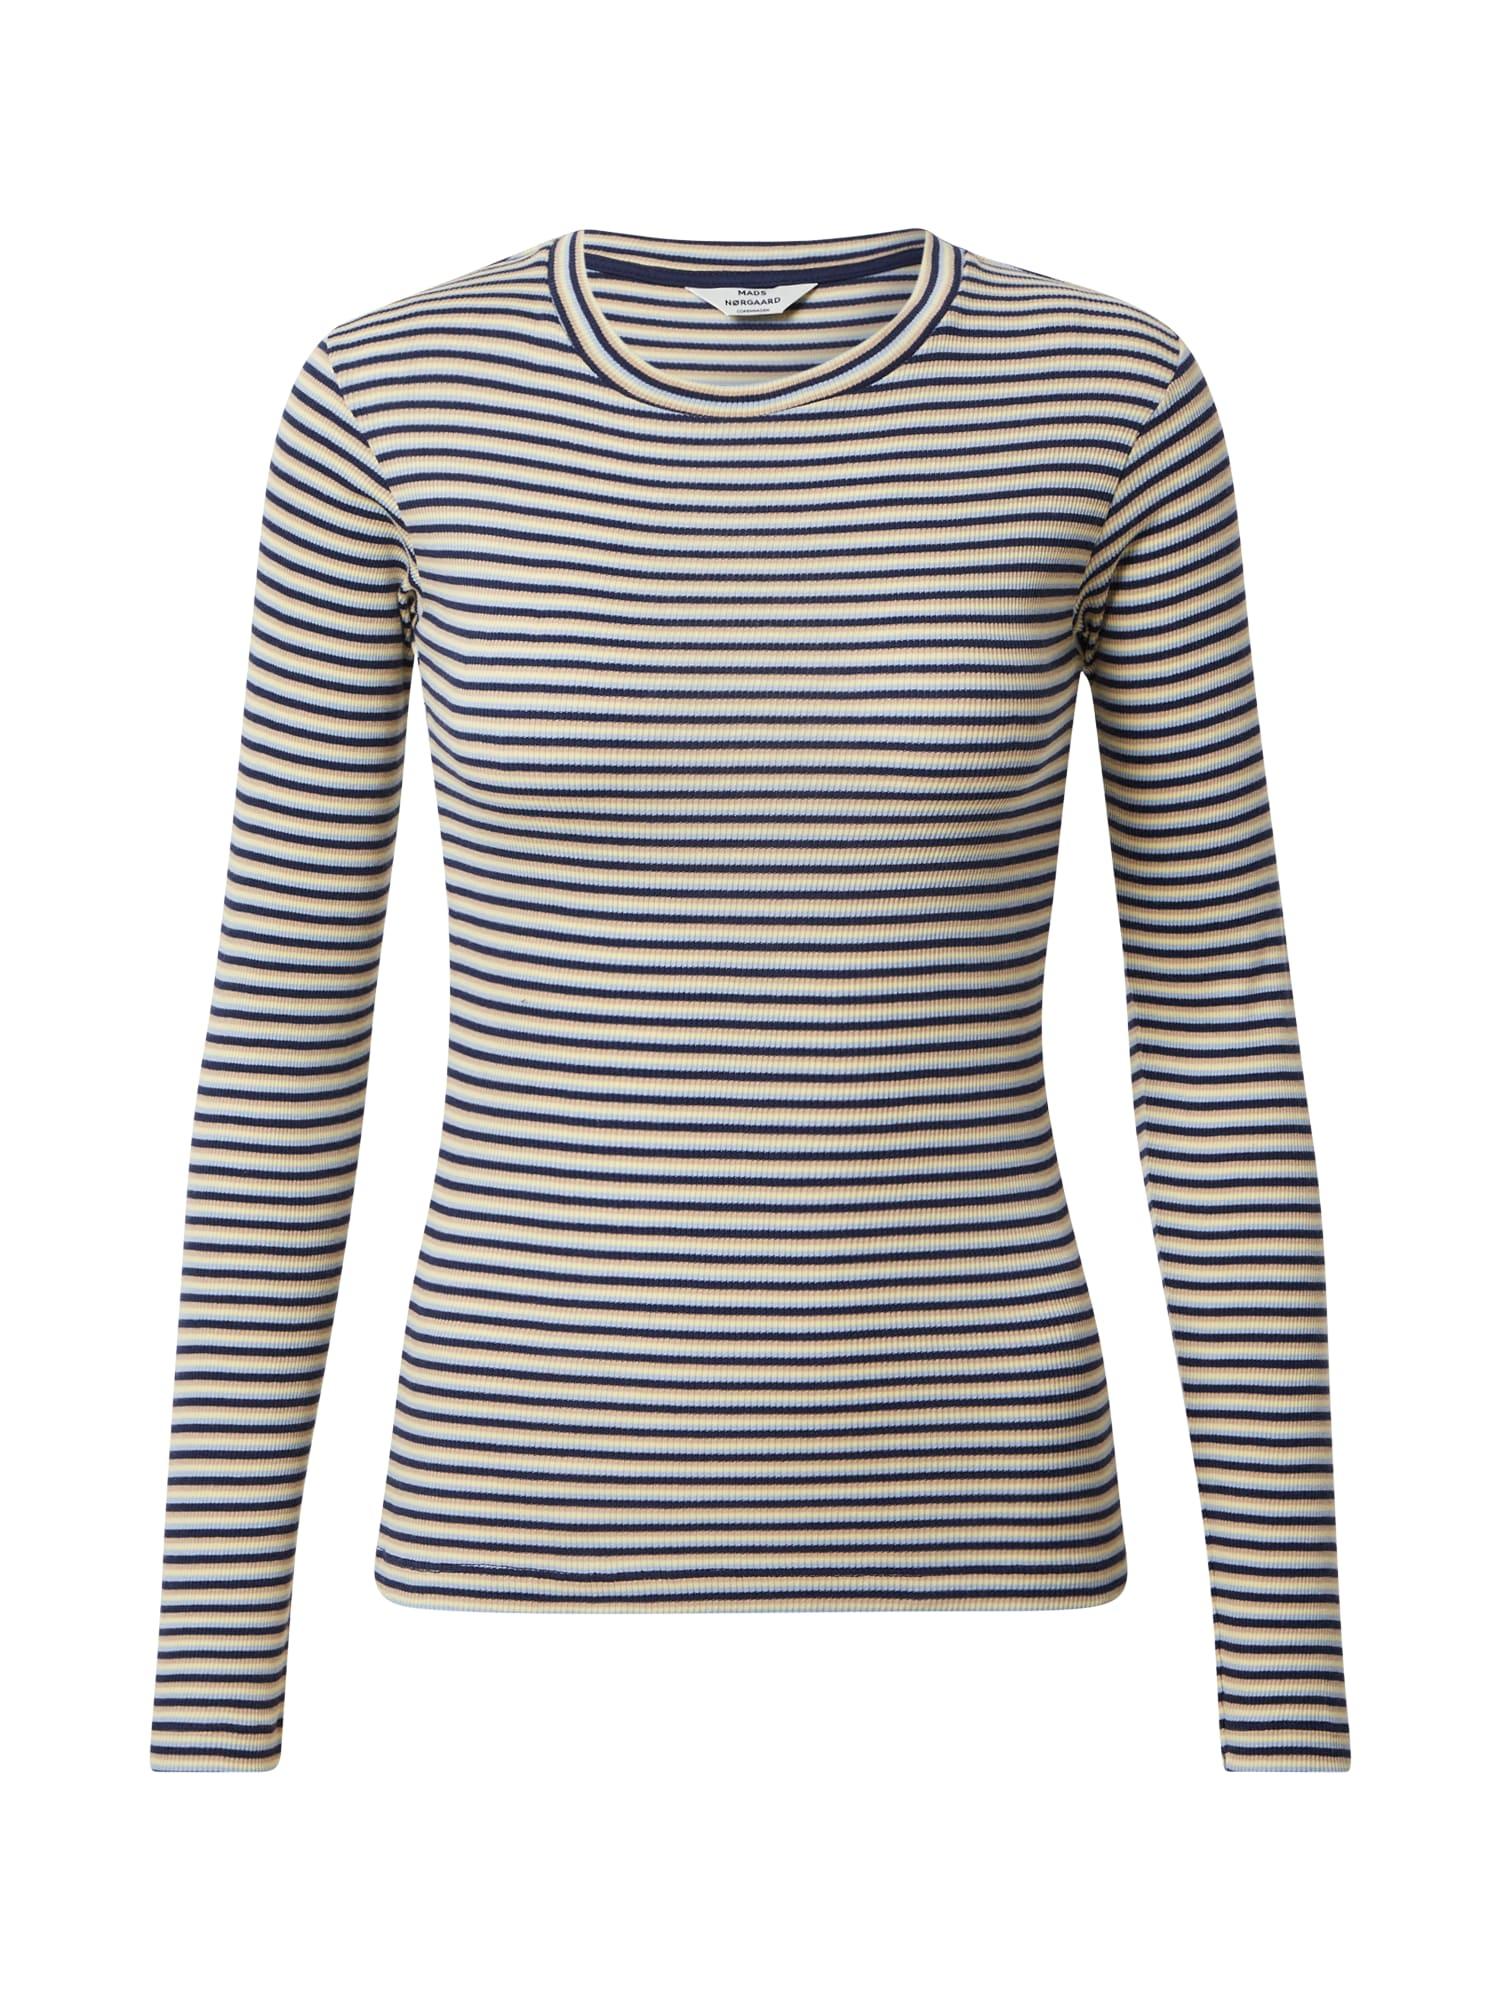 MADS NORGAARD COPENHAGEN Marškinėliai